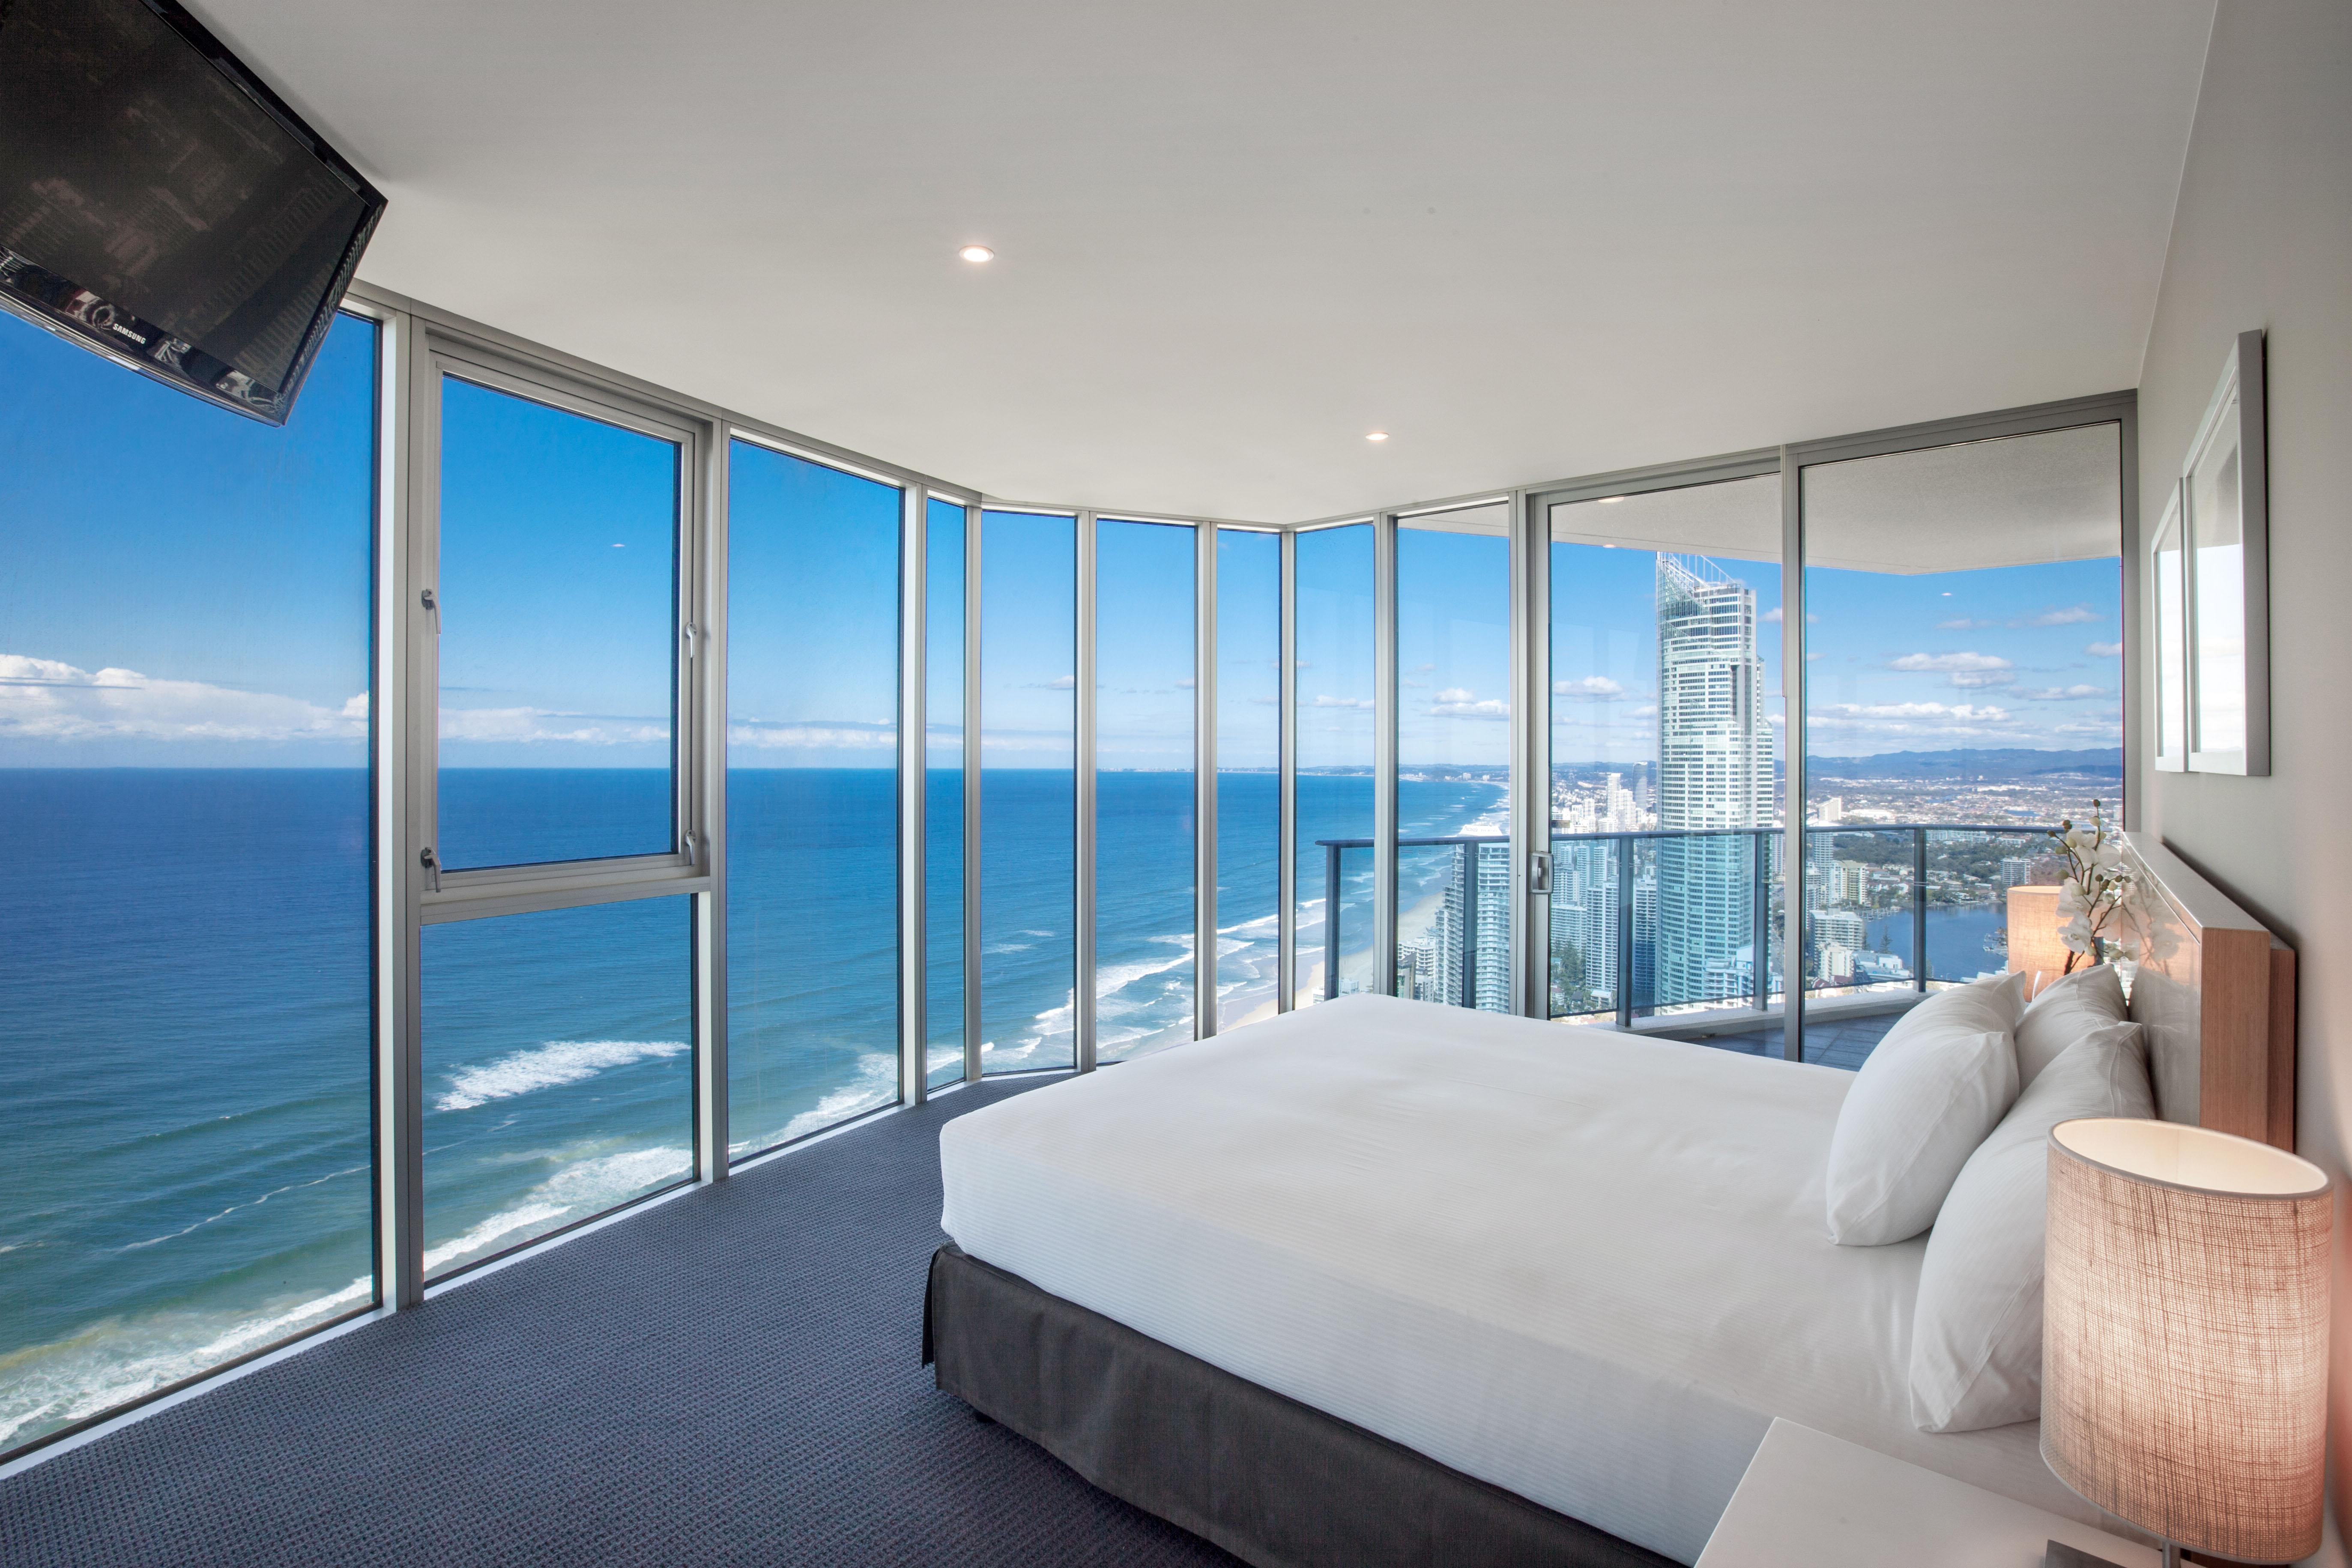 3 Bedroom Apartments Surfers Paradise